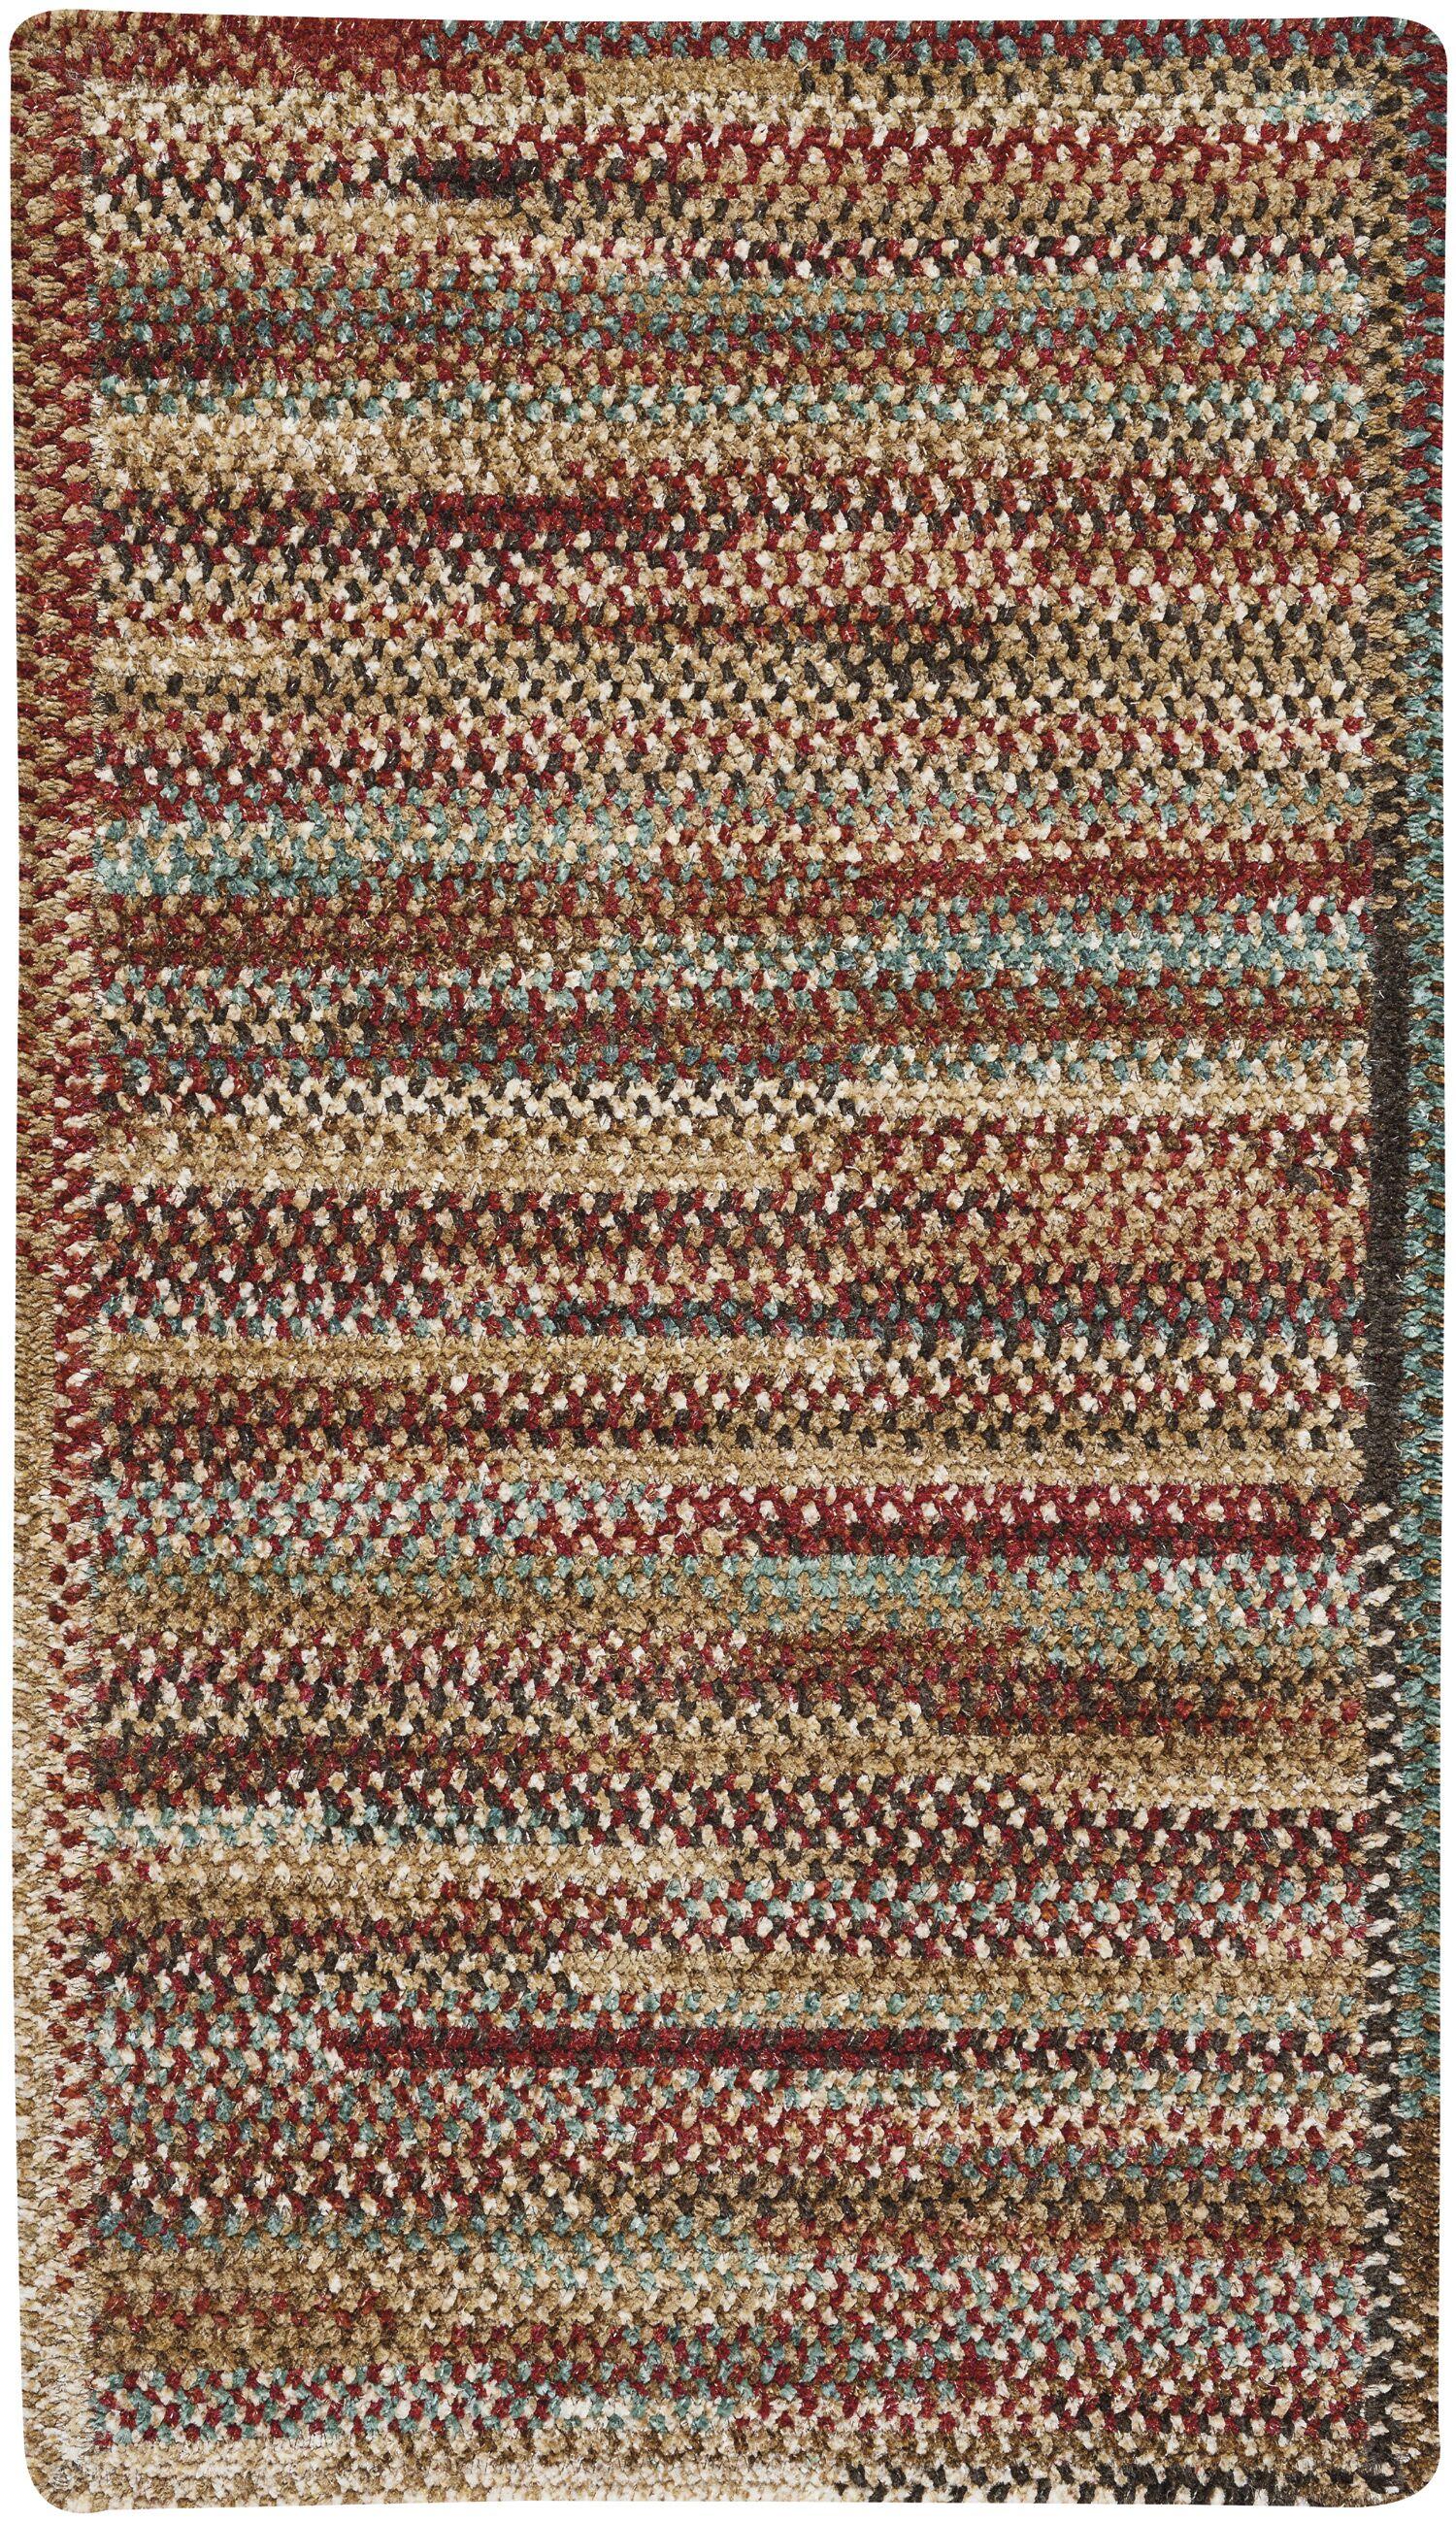 Eben Deep Red Area Rug Rug Size: Rectangle 5' x 8'